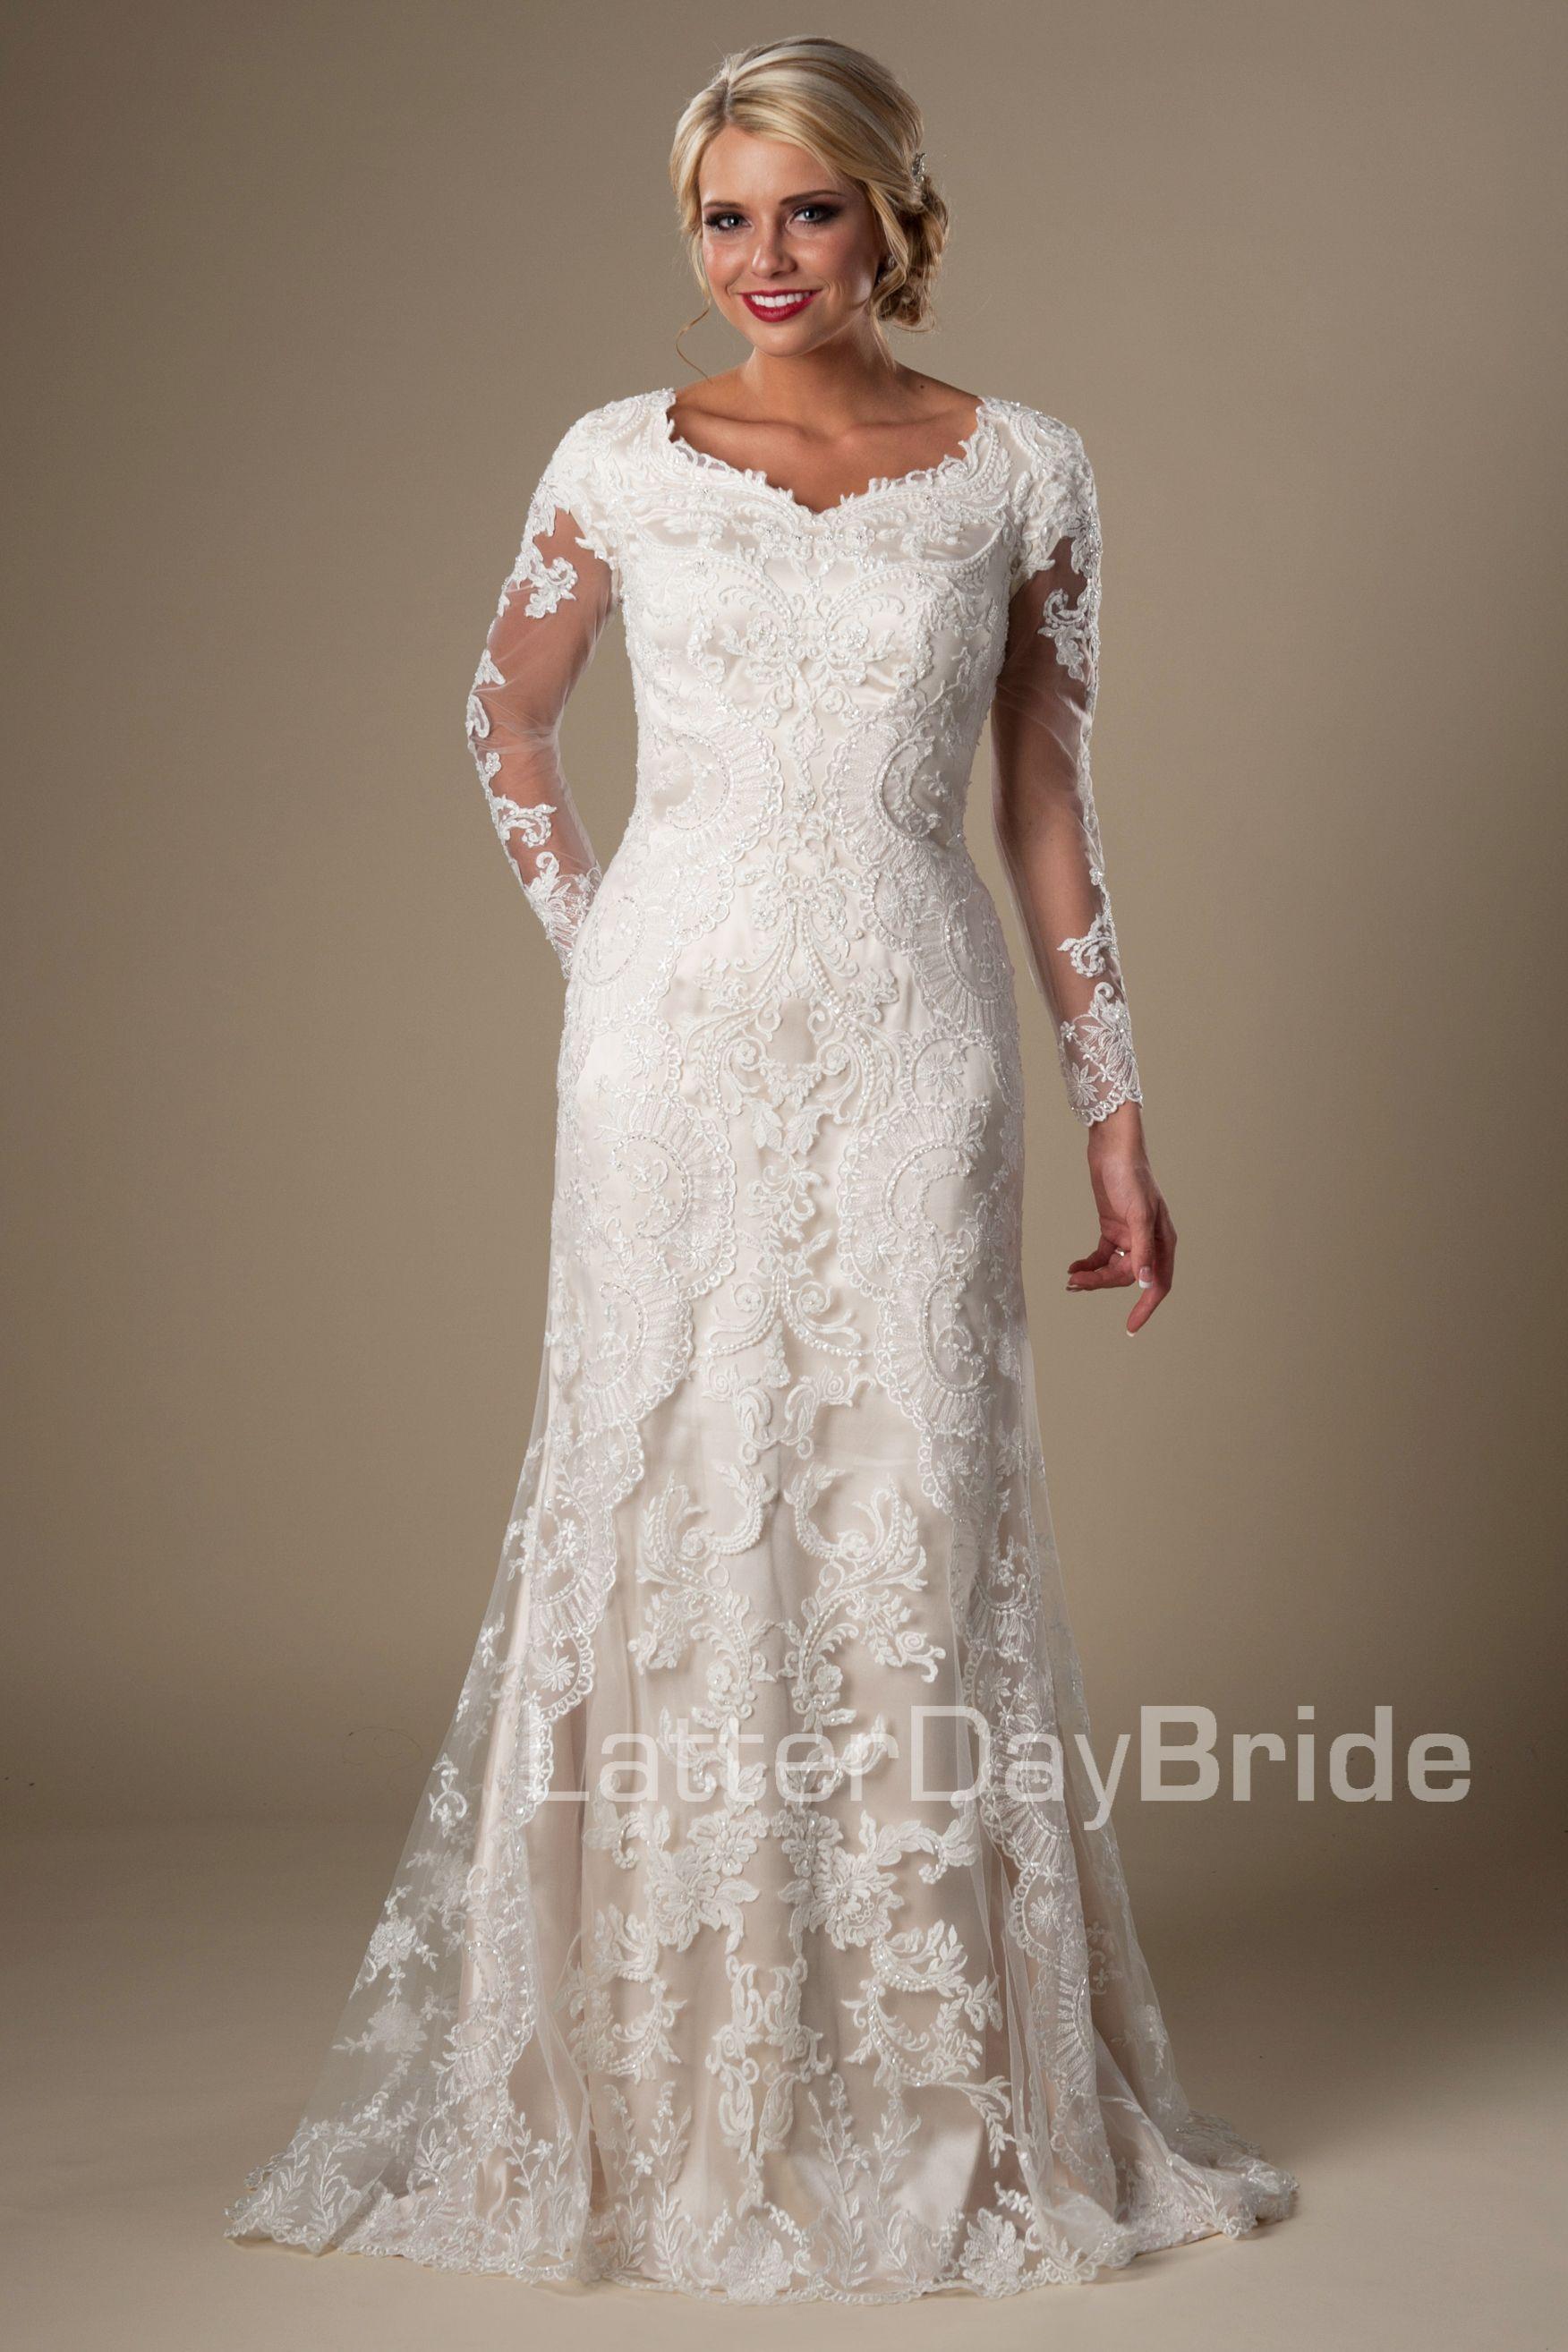 Caymbria Modest Lace Wedding Dress Latterdaybride Prom Lds Bridal Gown Slc Utah Worldwide Shipping Visually Stunning Fl